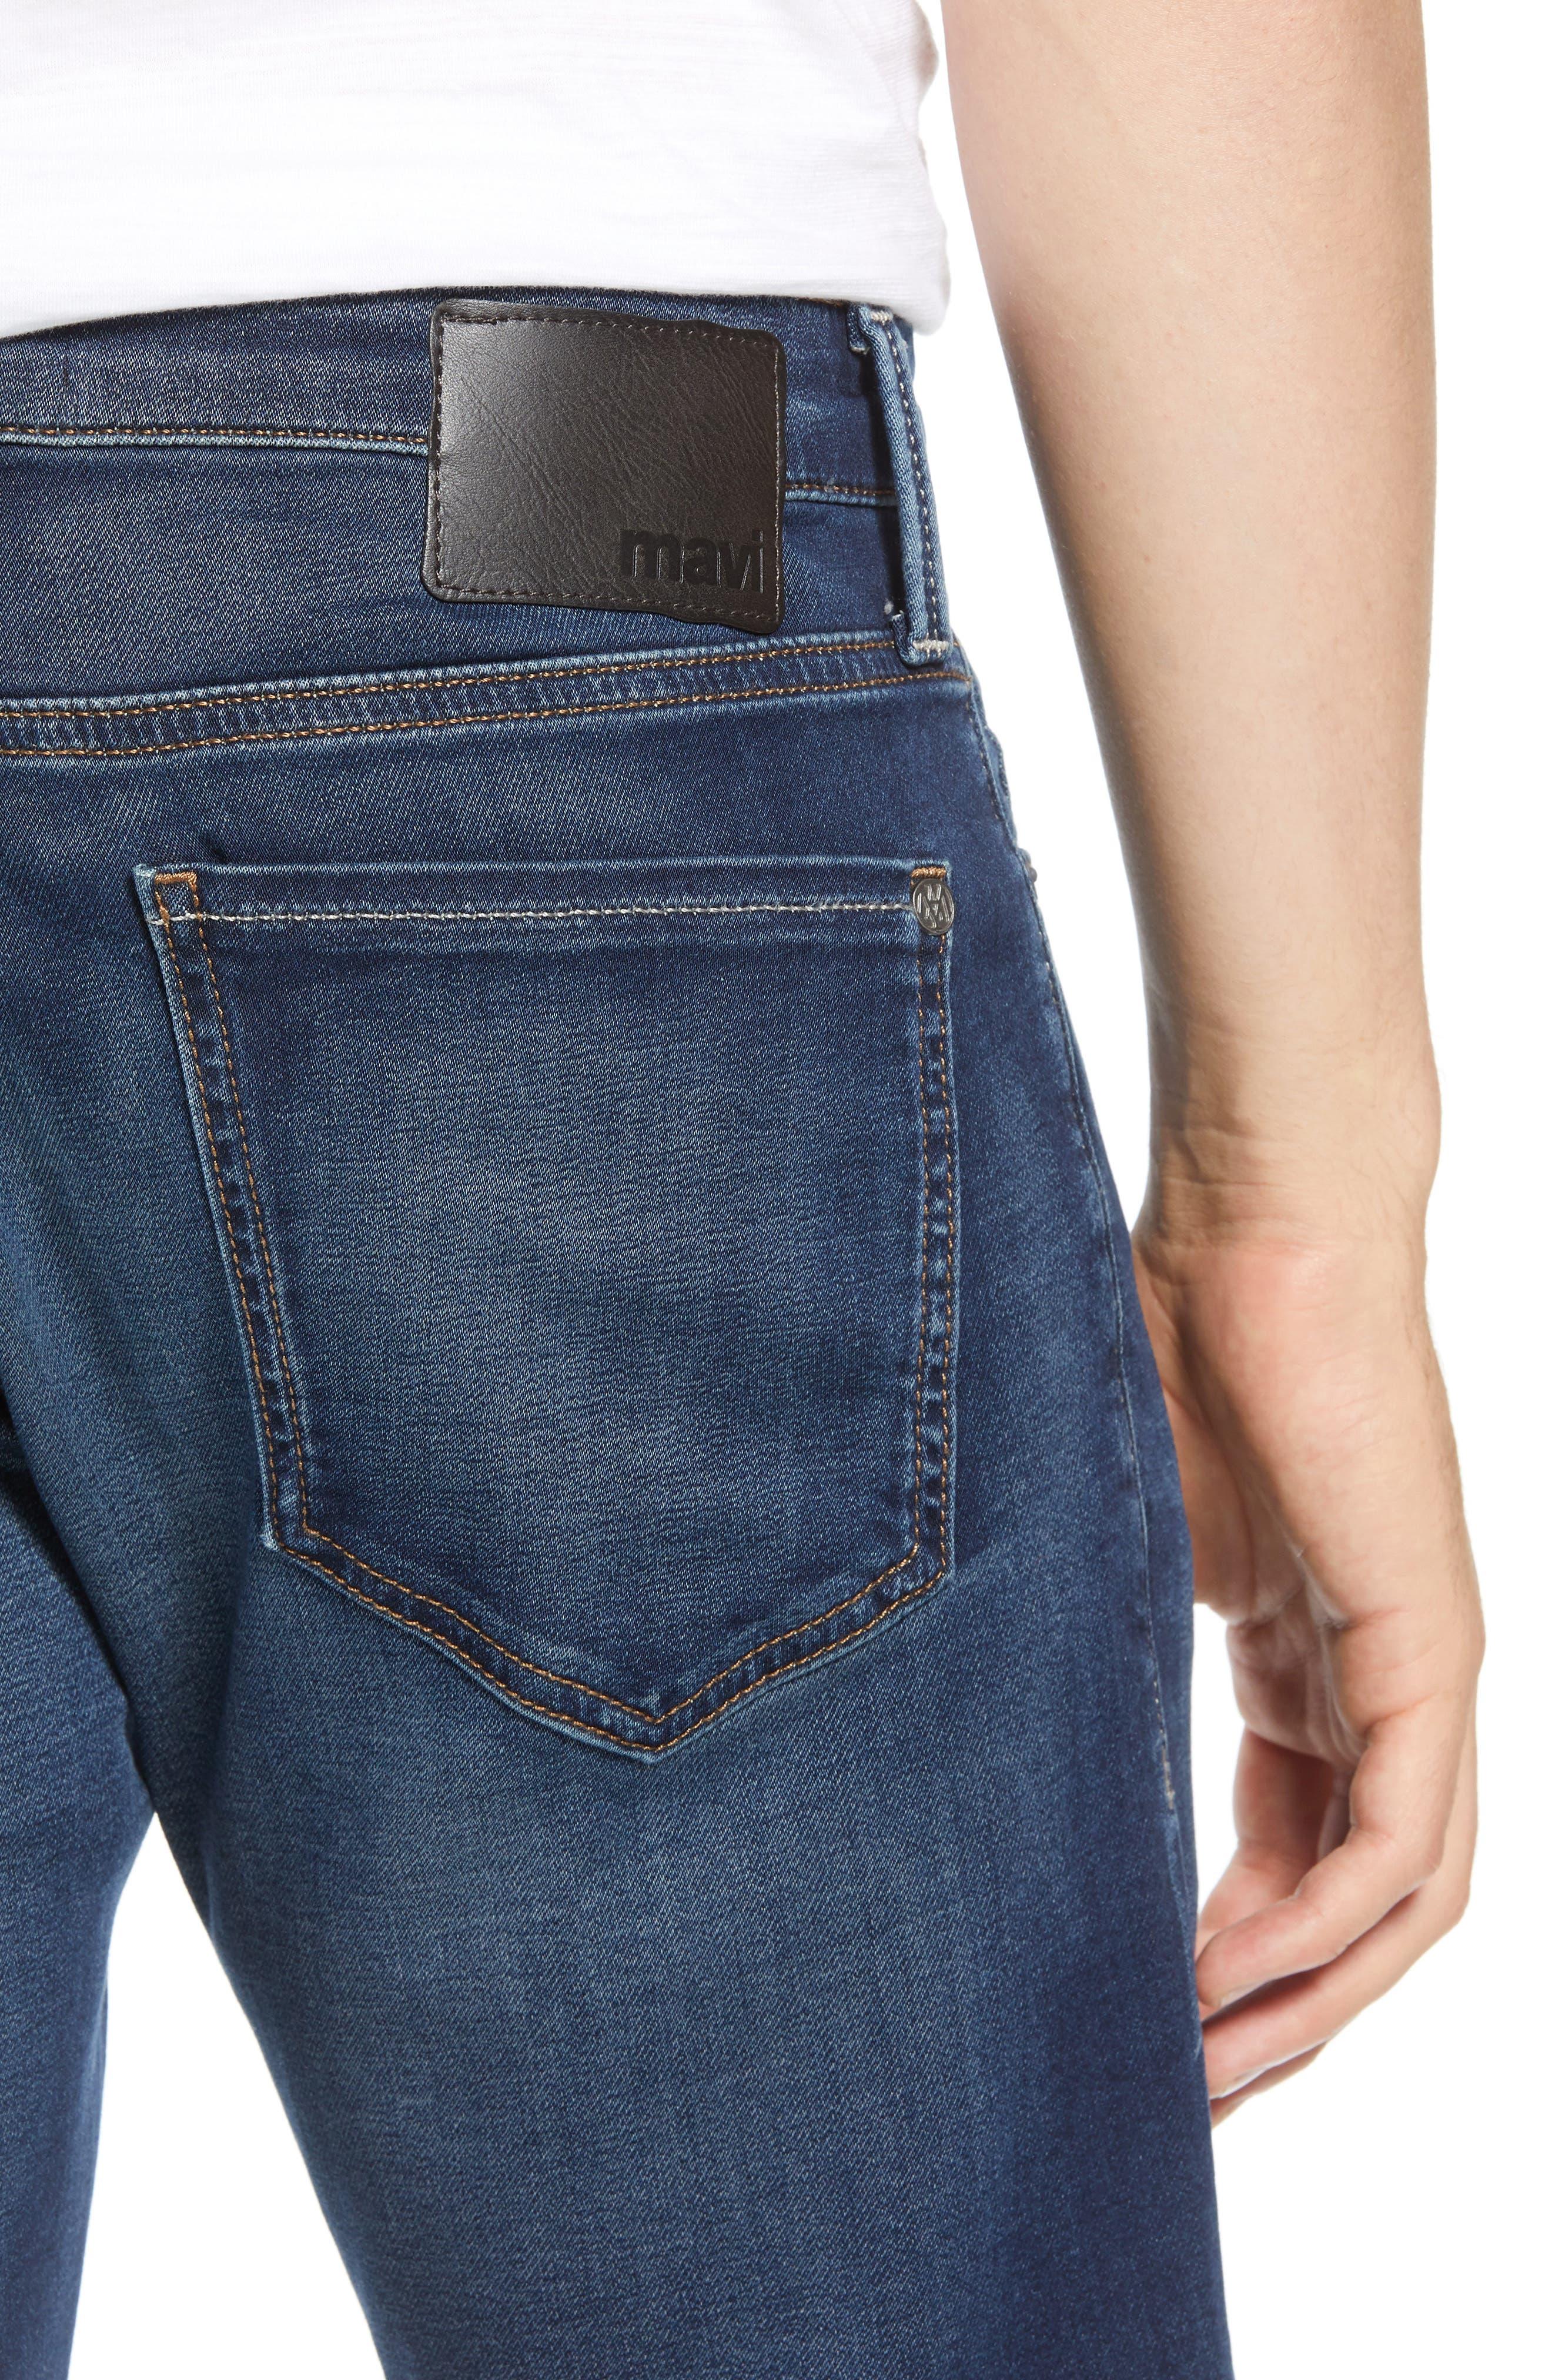 Jake Slim Fit Jeans,                             Alternate thumbnail 4, color,                             DARK SPORTY